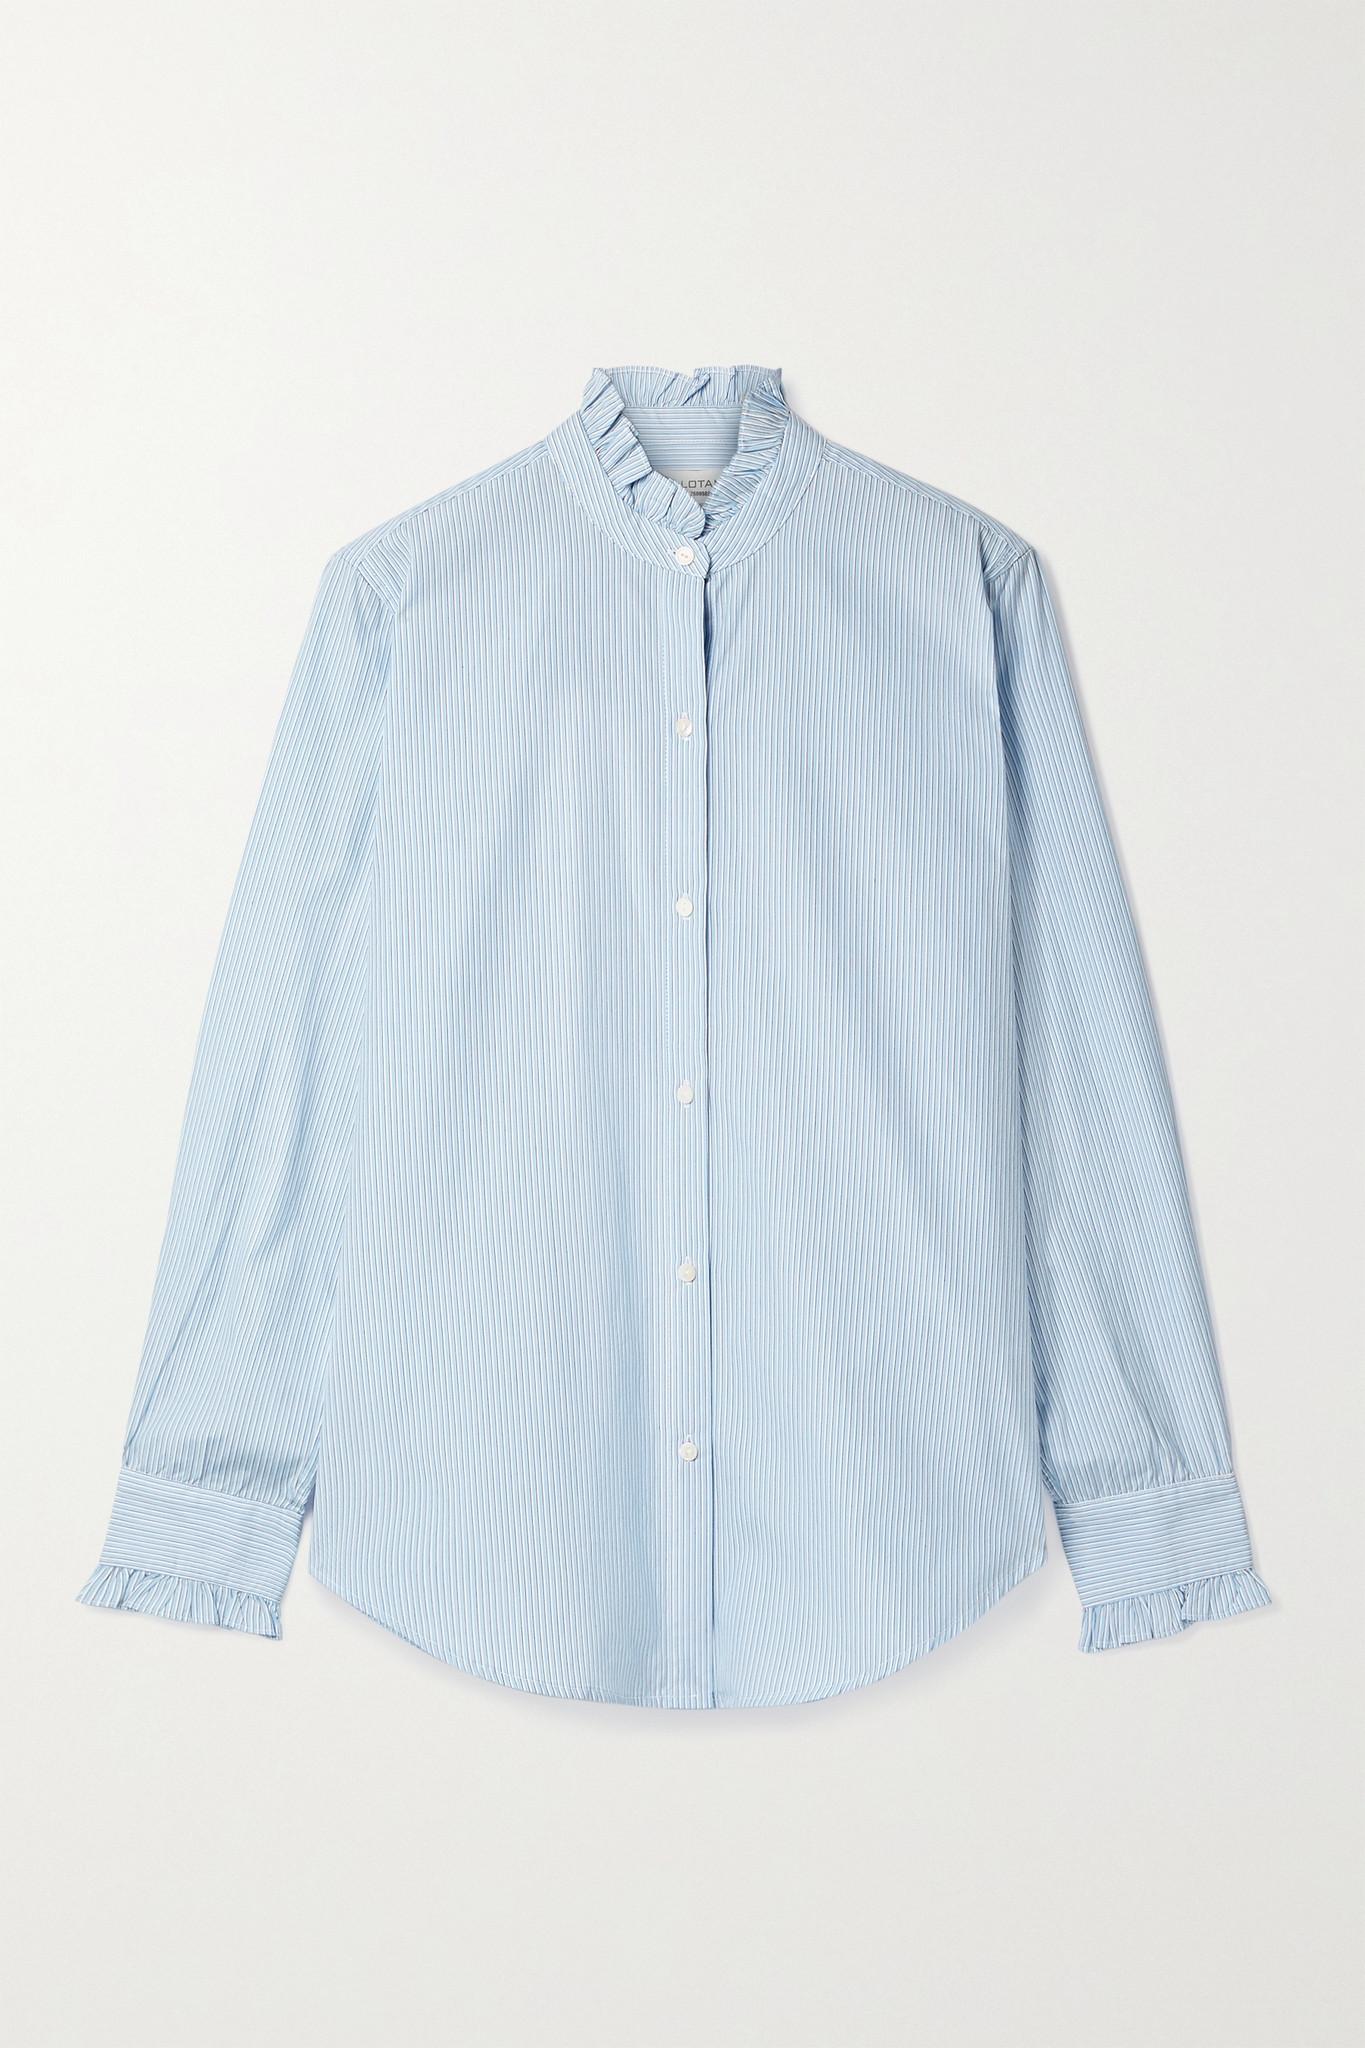 NILI LOTAN - Lydia 荷叶边条纹纯棉府绸衬衫 - 蓝色 - large